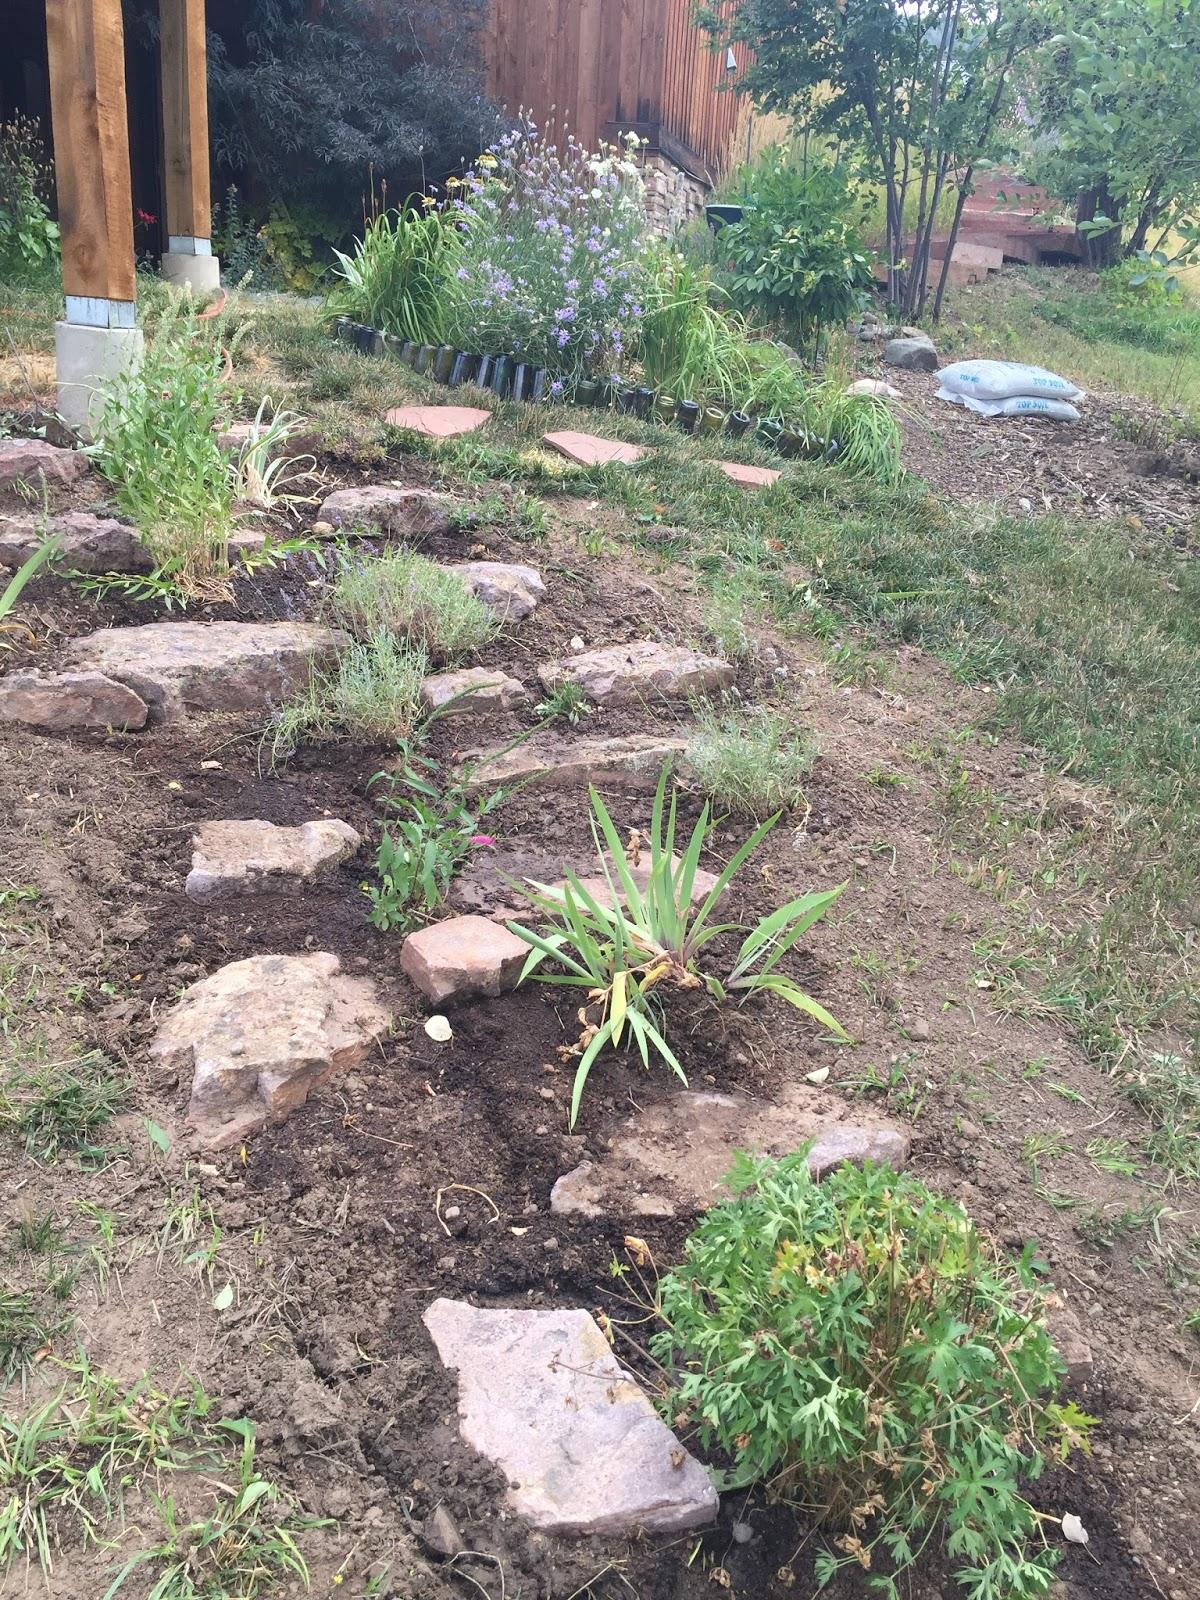 How to install a rock garden by Barbra Flowers, Master Gardener